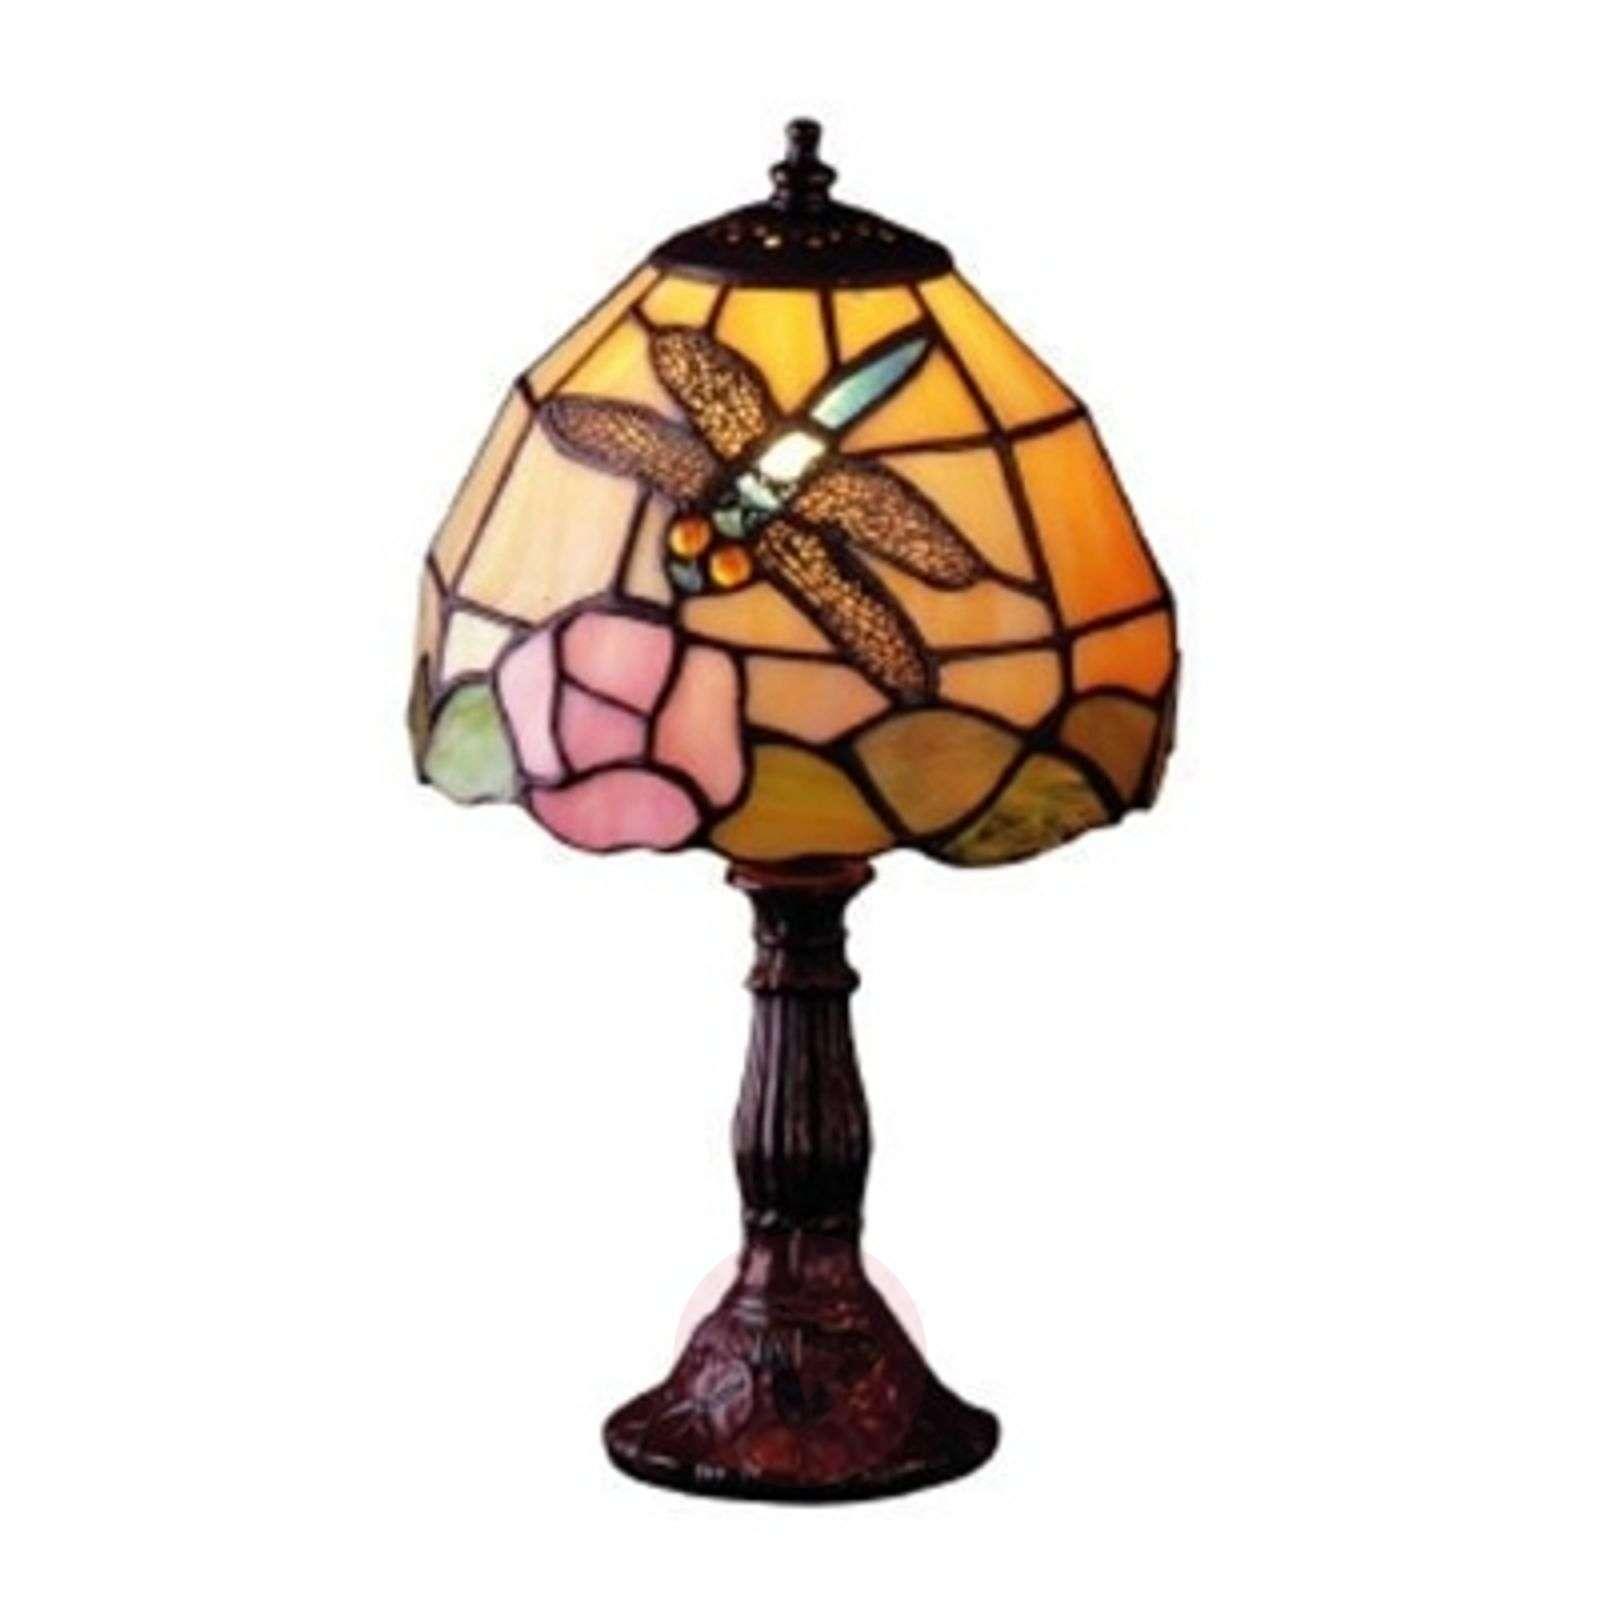 Tiffany style table lamp JANNEKE-1032197-01